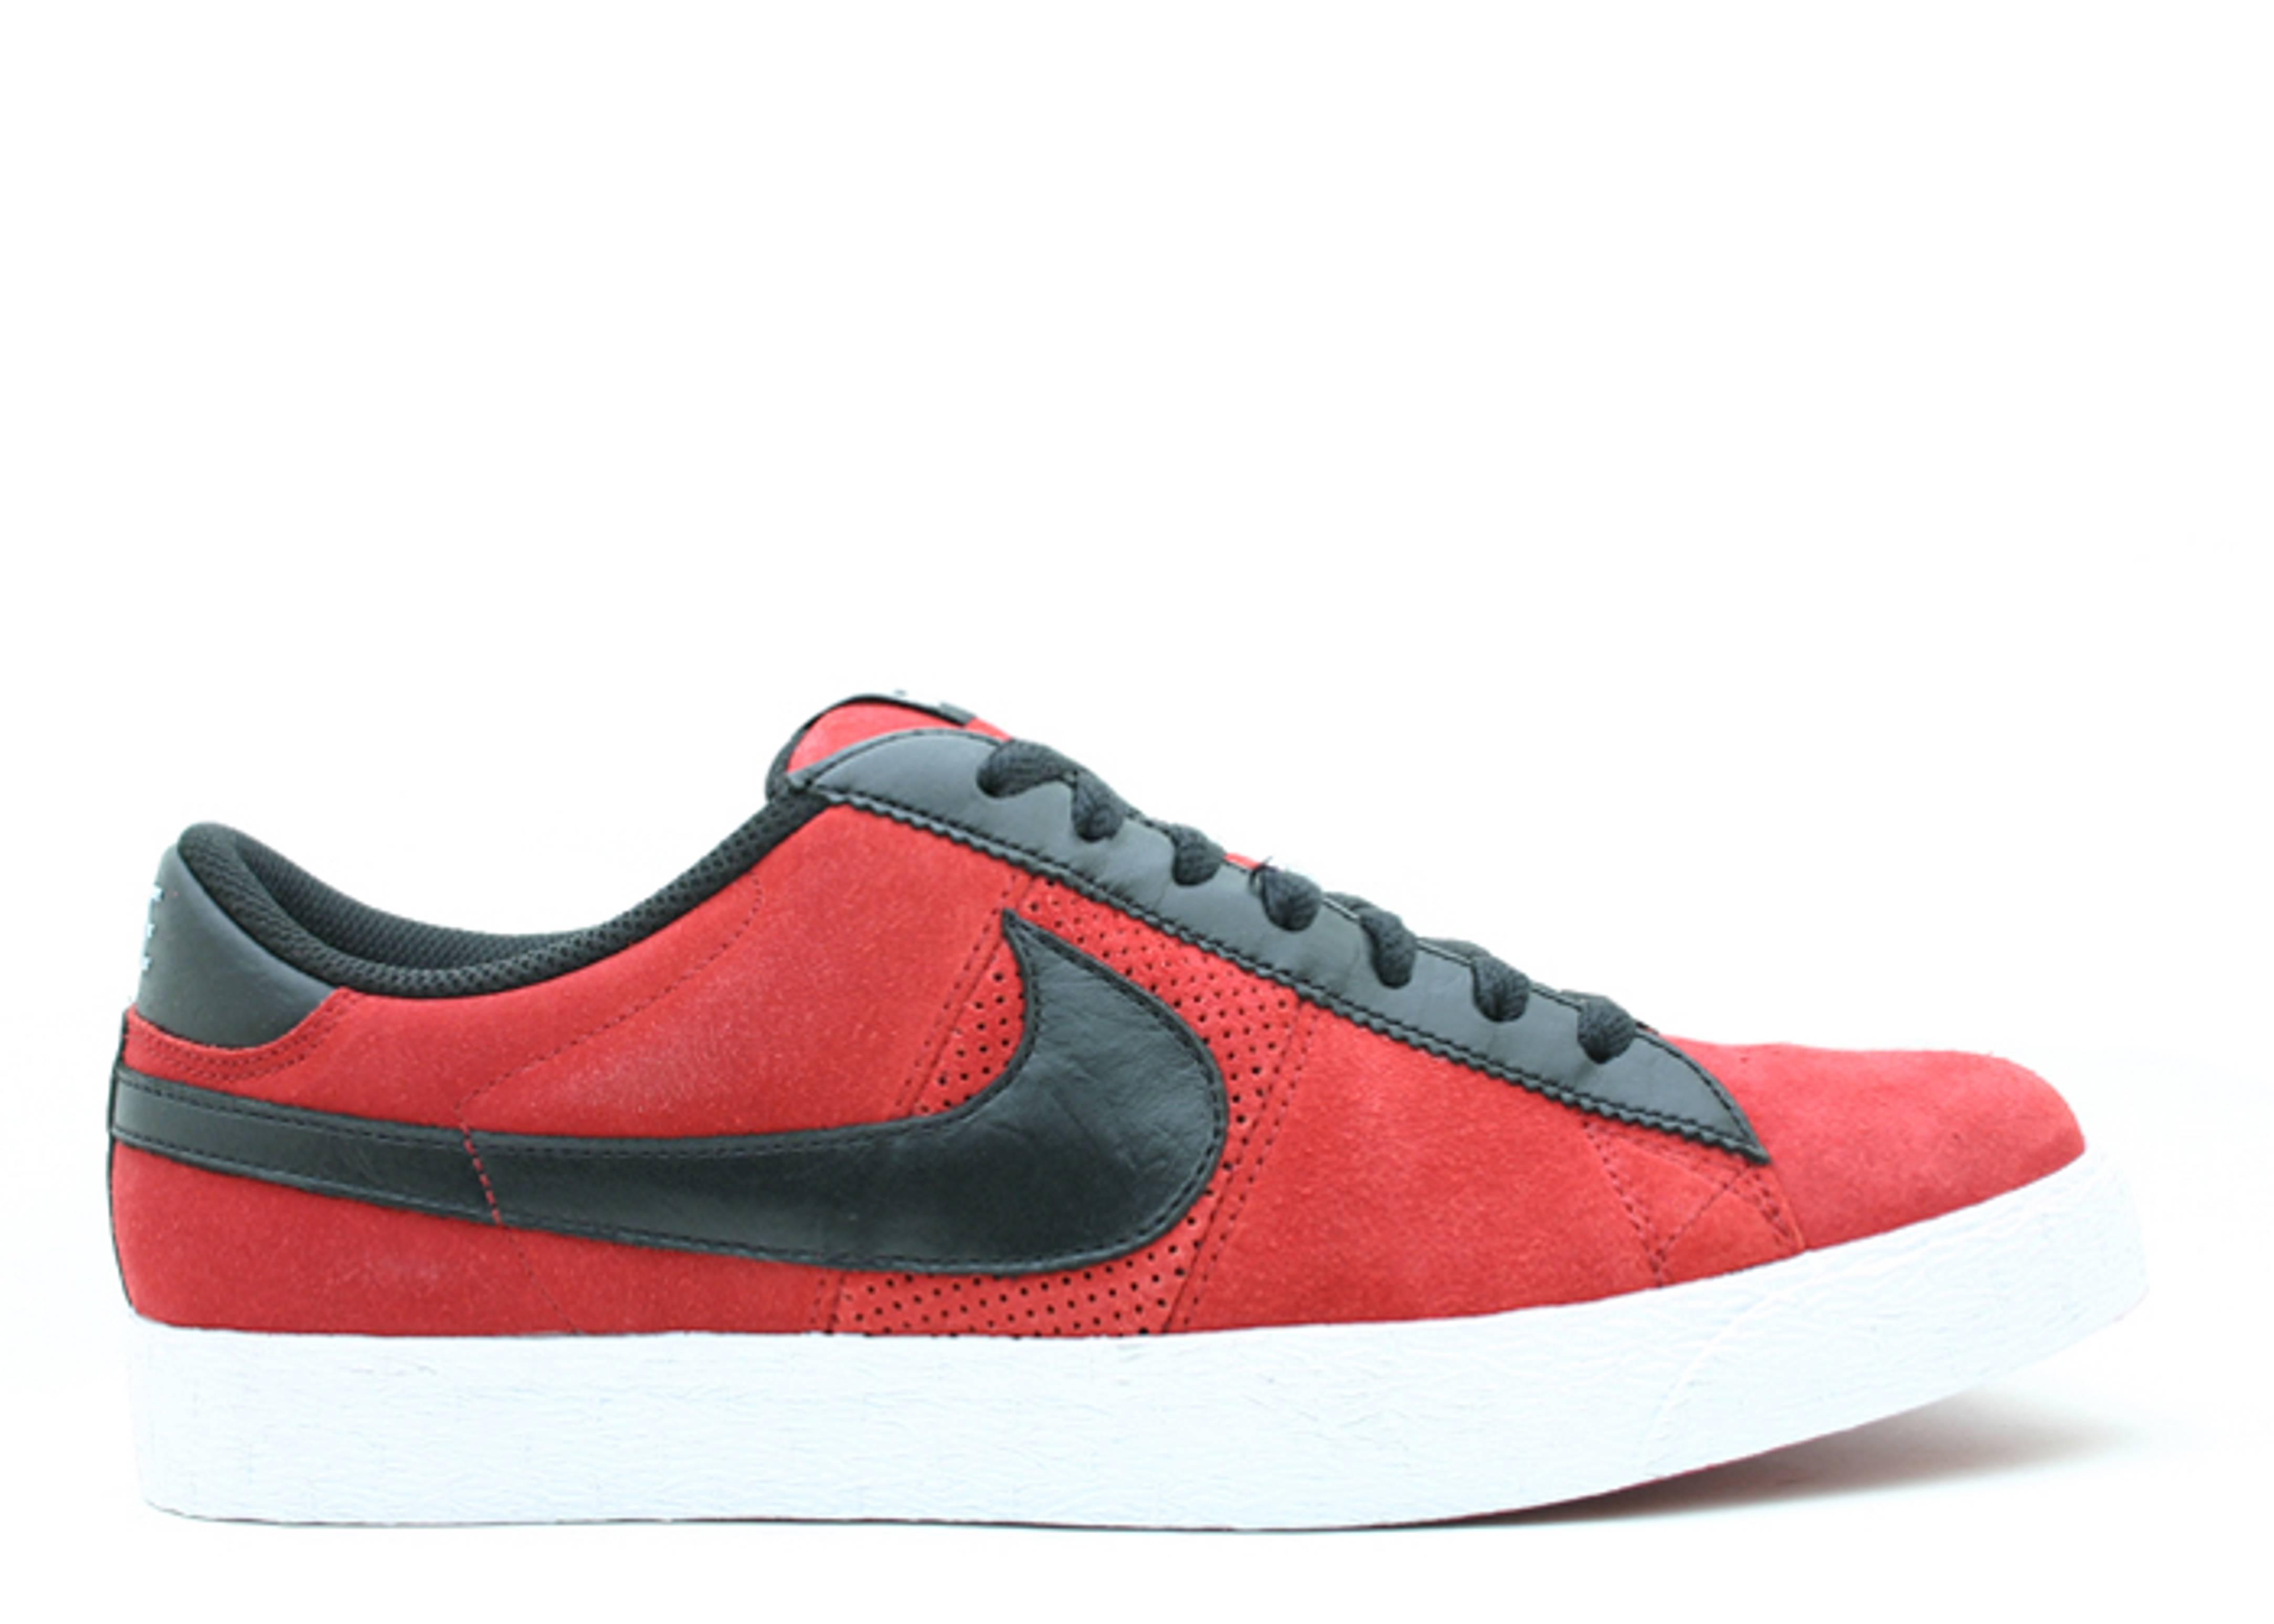 separation shoes 5798f 609df ... SB - Newsprint White Blazer Low Premium - Nike - 317070 601 - varsity  red black Flight Club ...